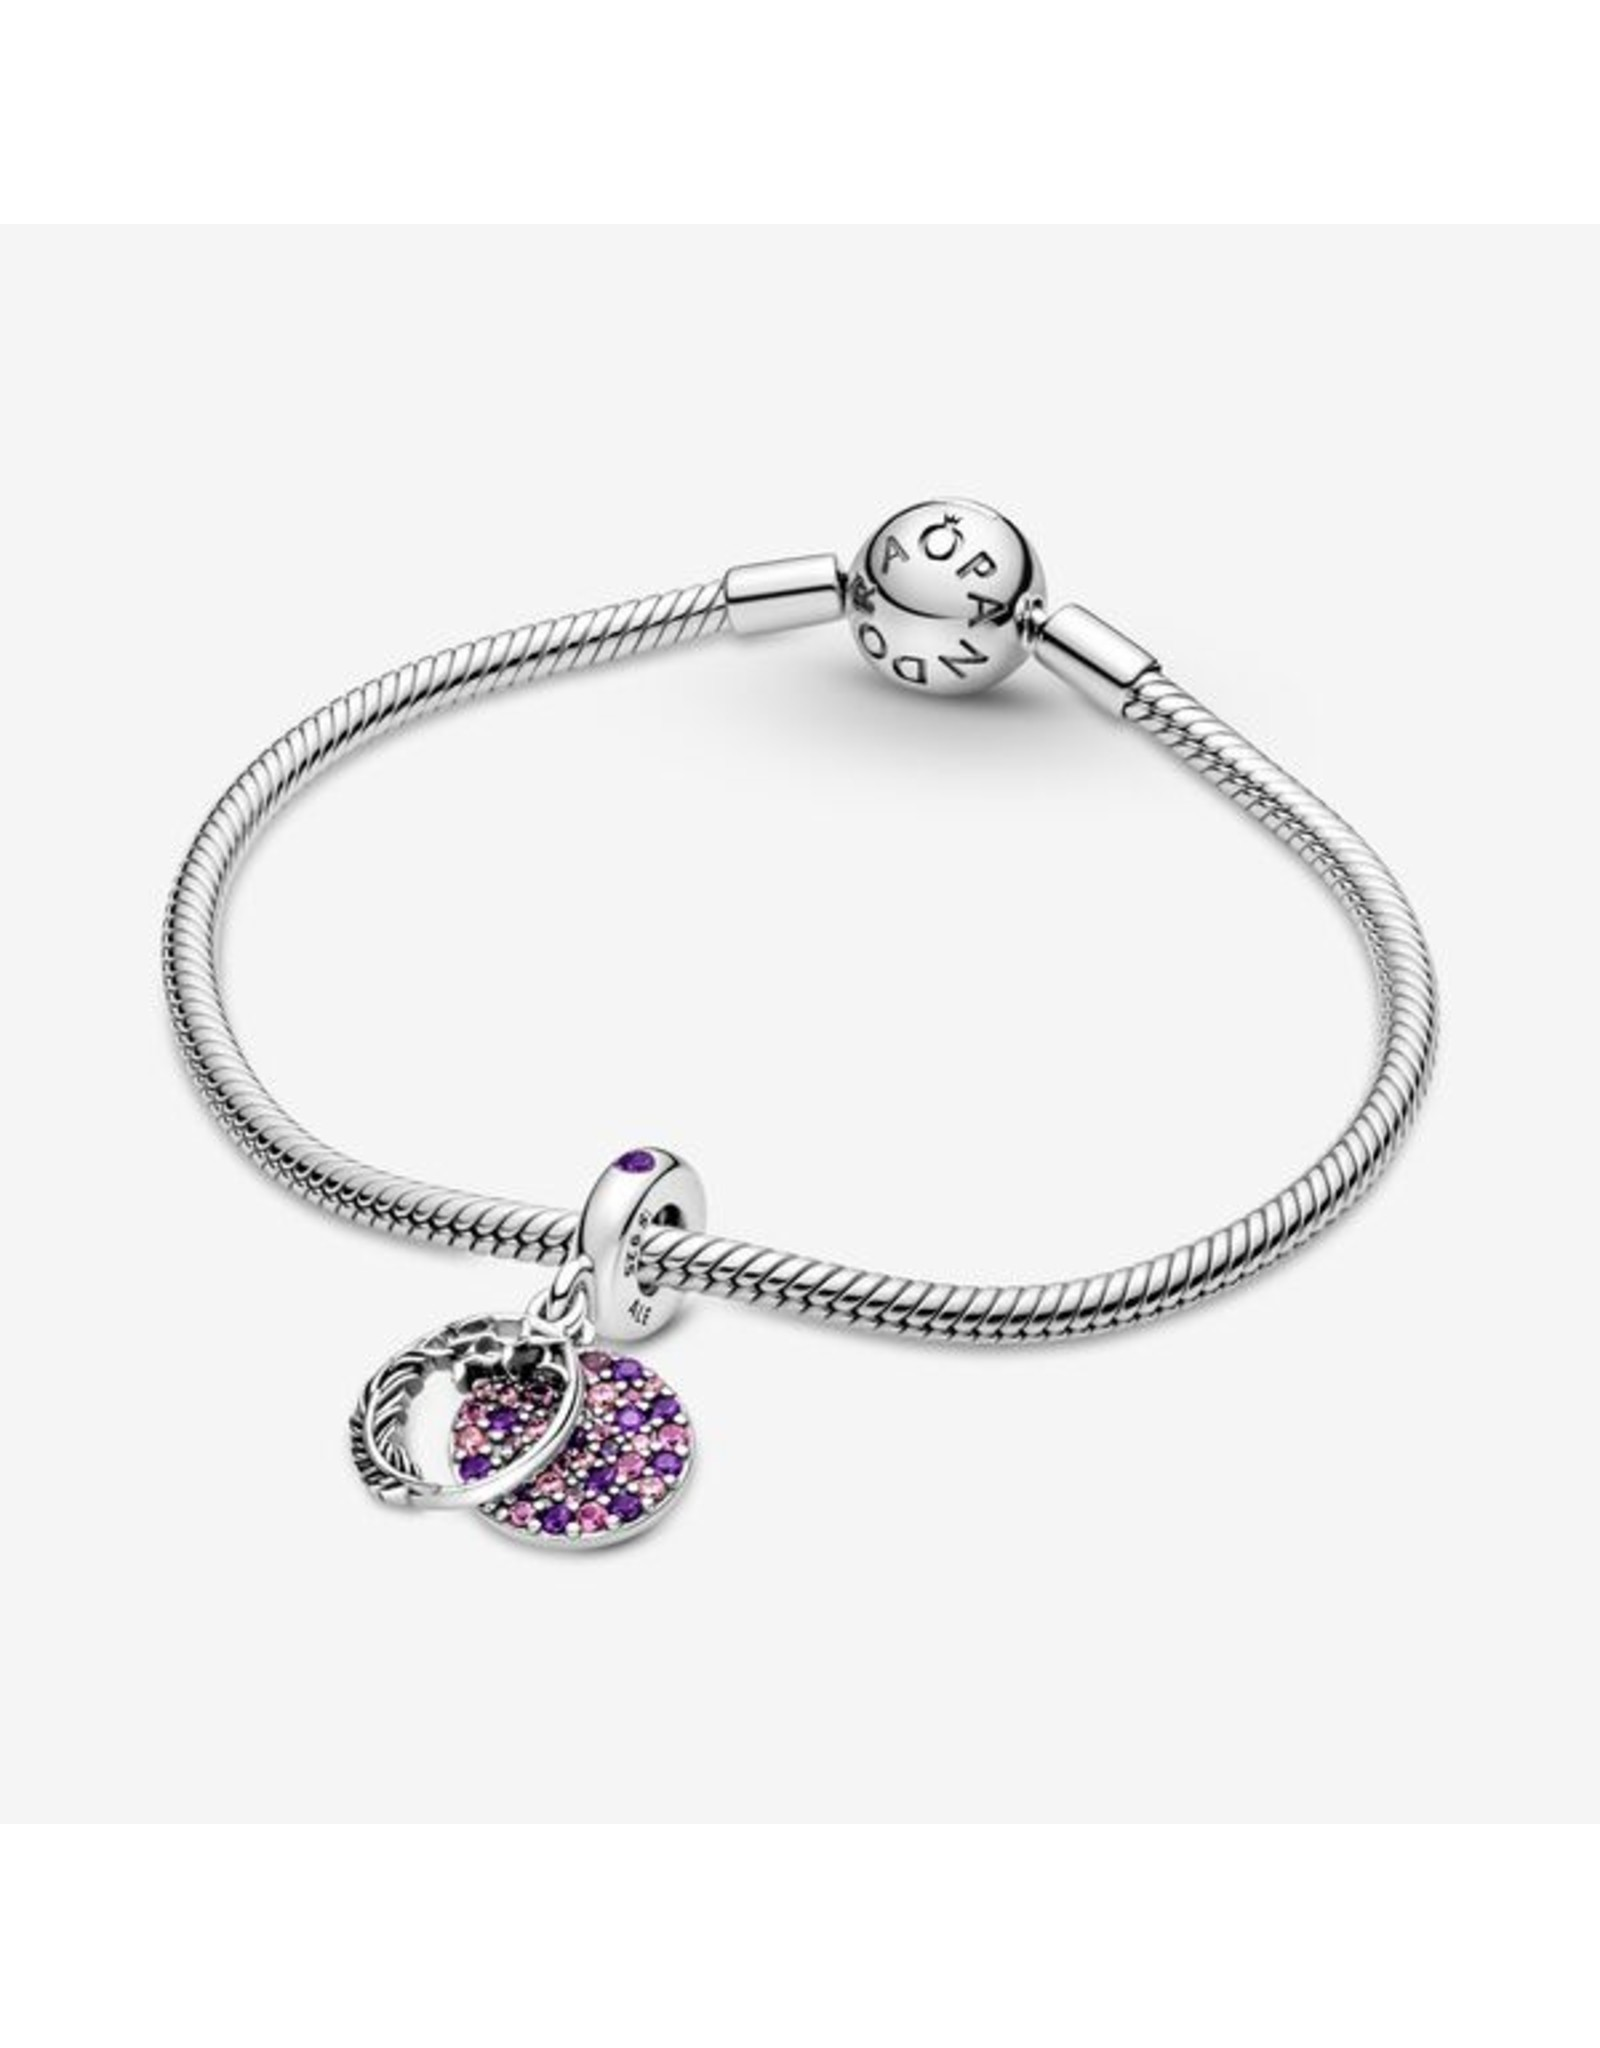 Pandora Pandora Charm,799561C01, Pavé Feather Dangle, Multi-Colored Crystals & Pink